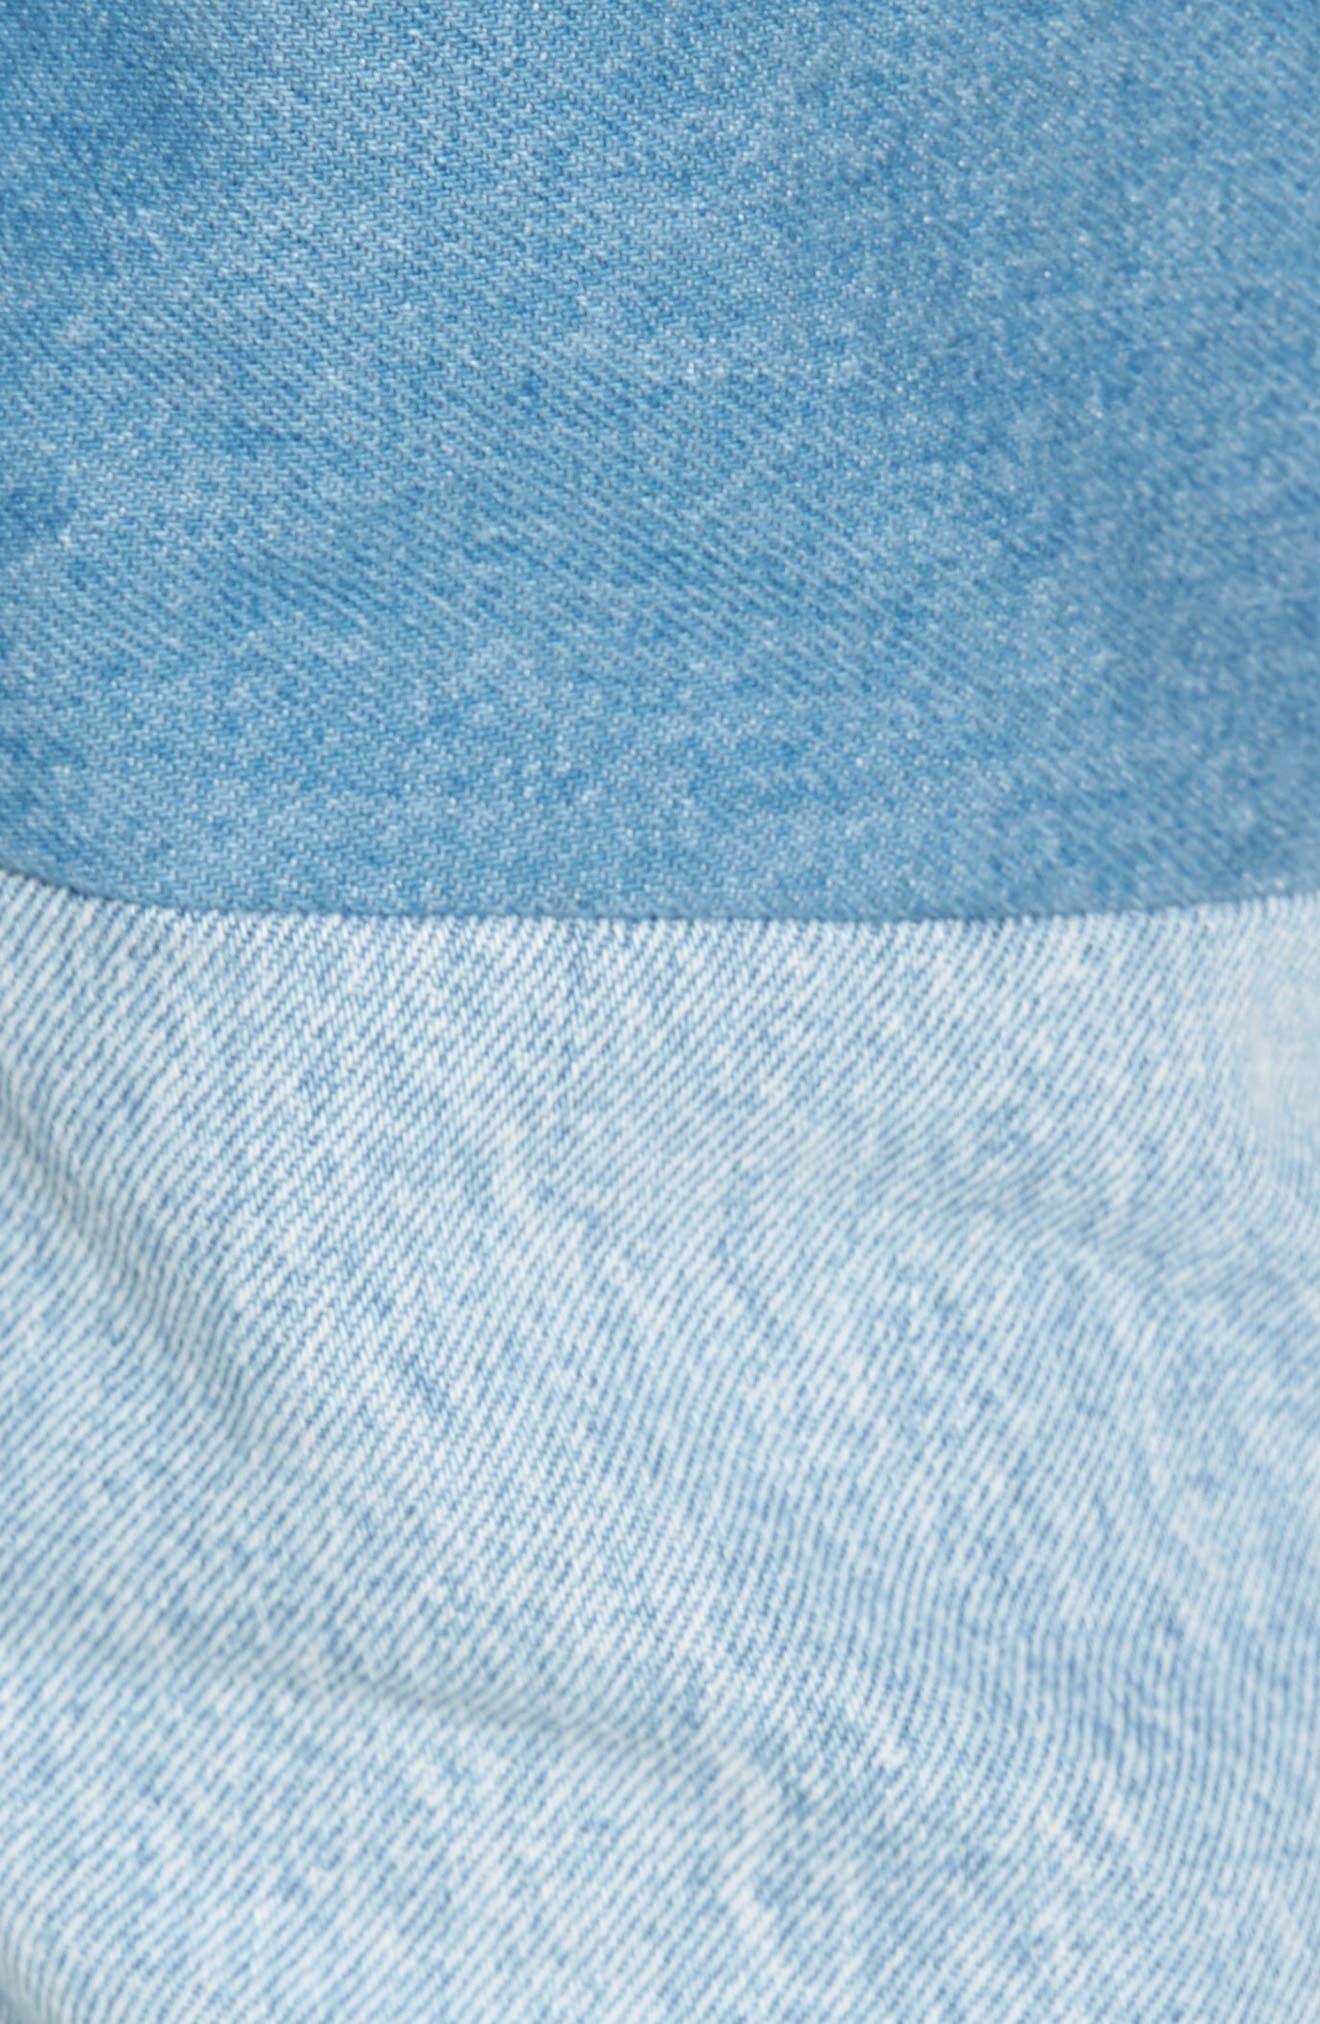 Studio Slim Fit Jeans,                             Alternate thumbnail 5, color,                             420